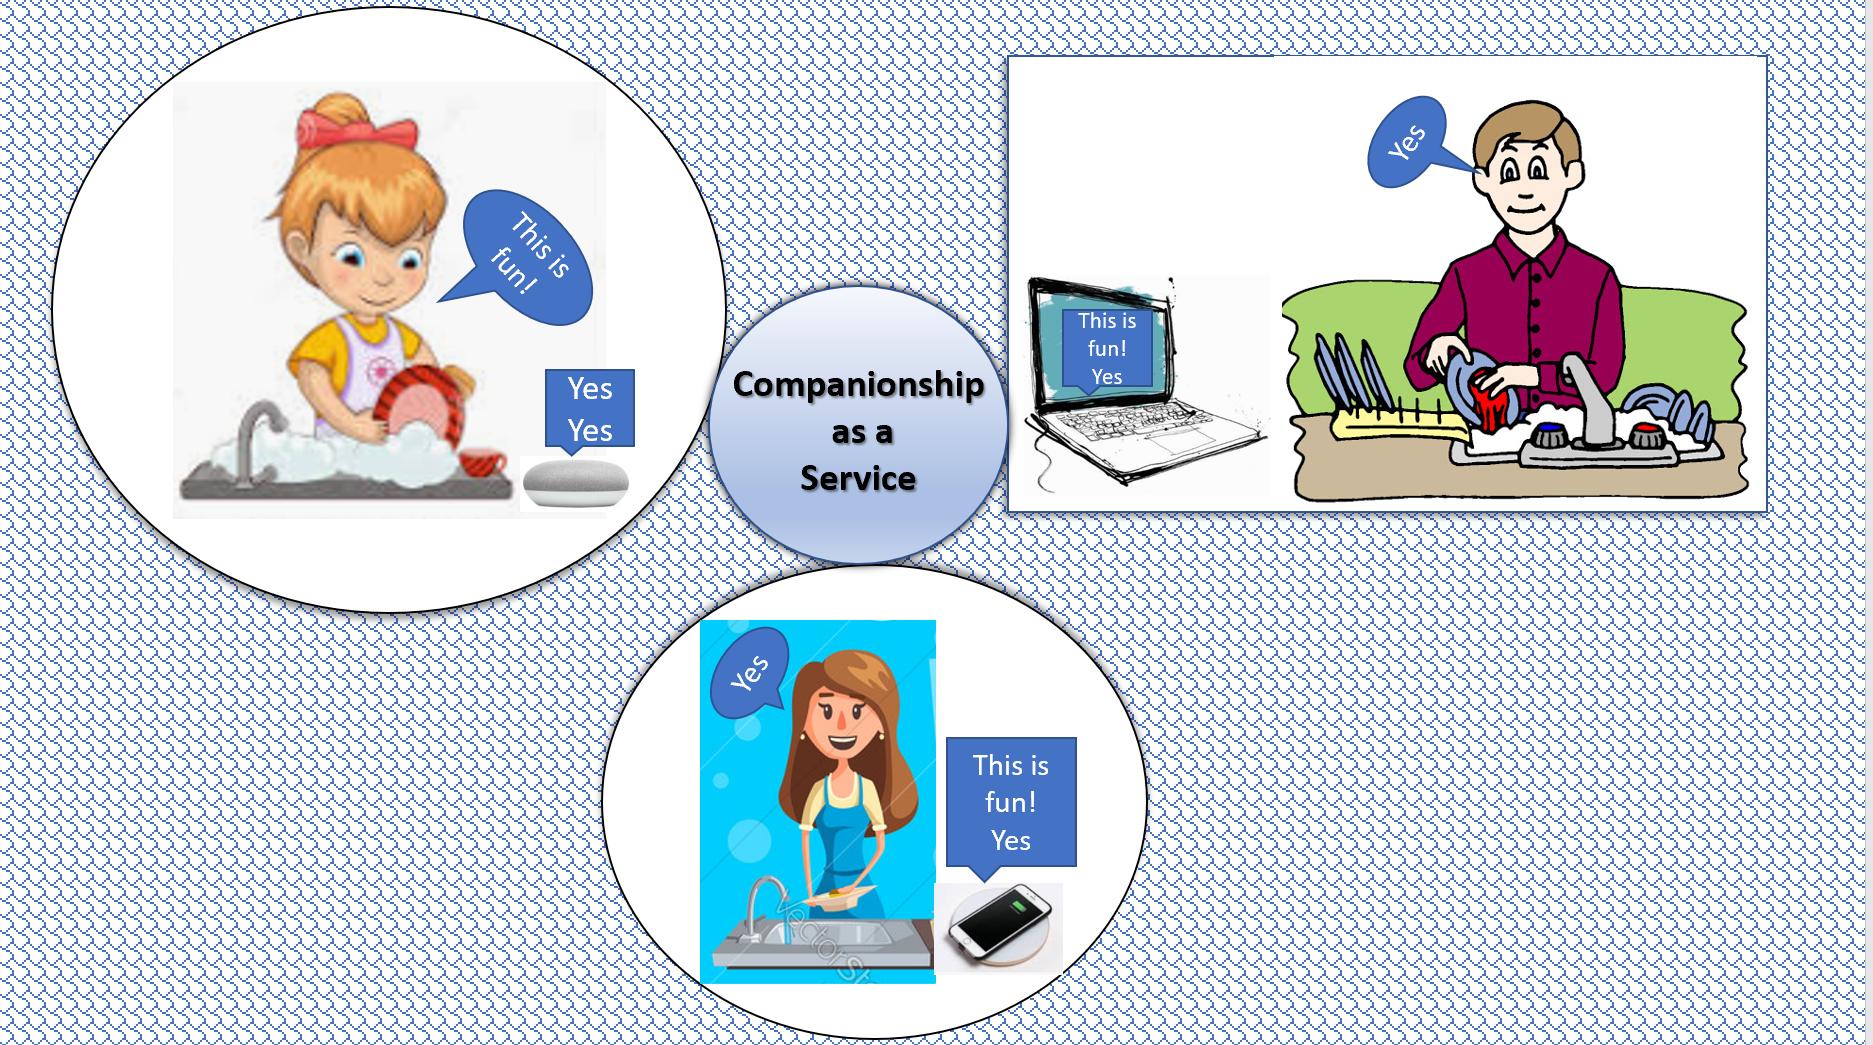 Companionship as a Service